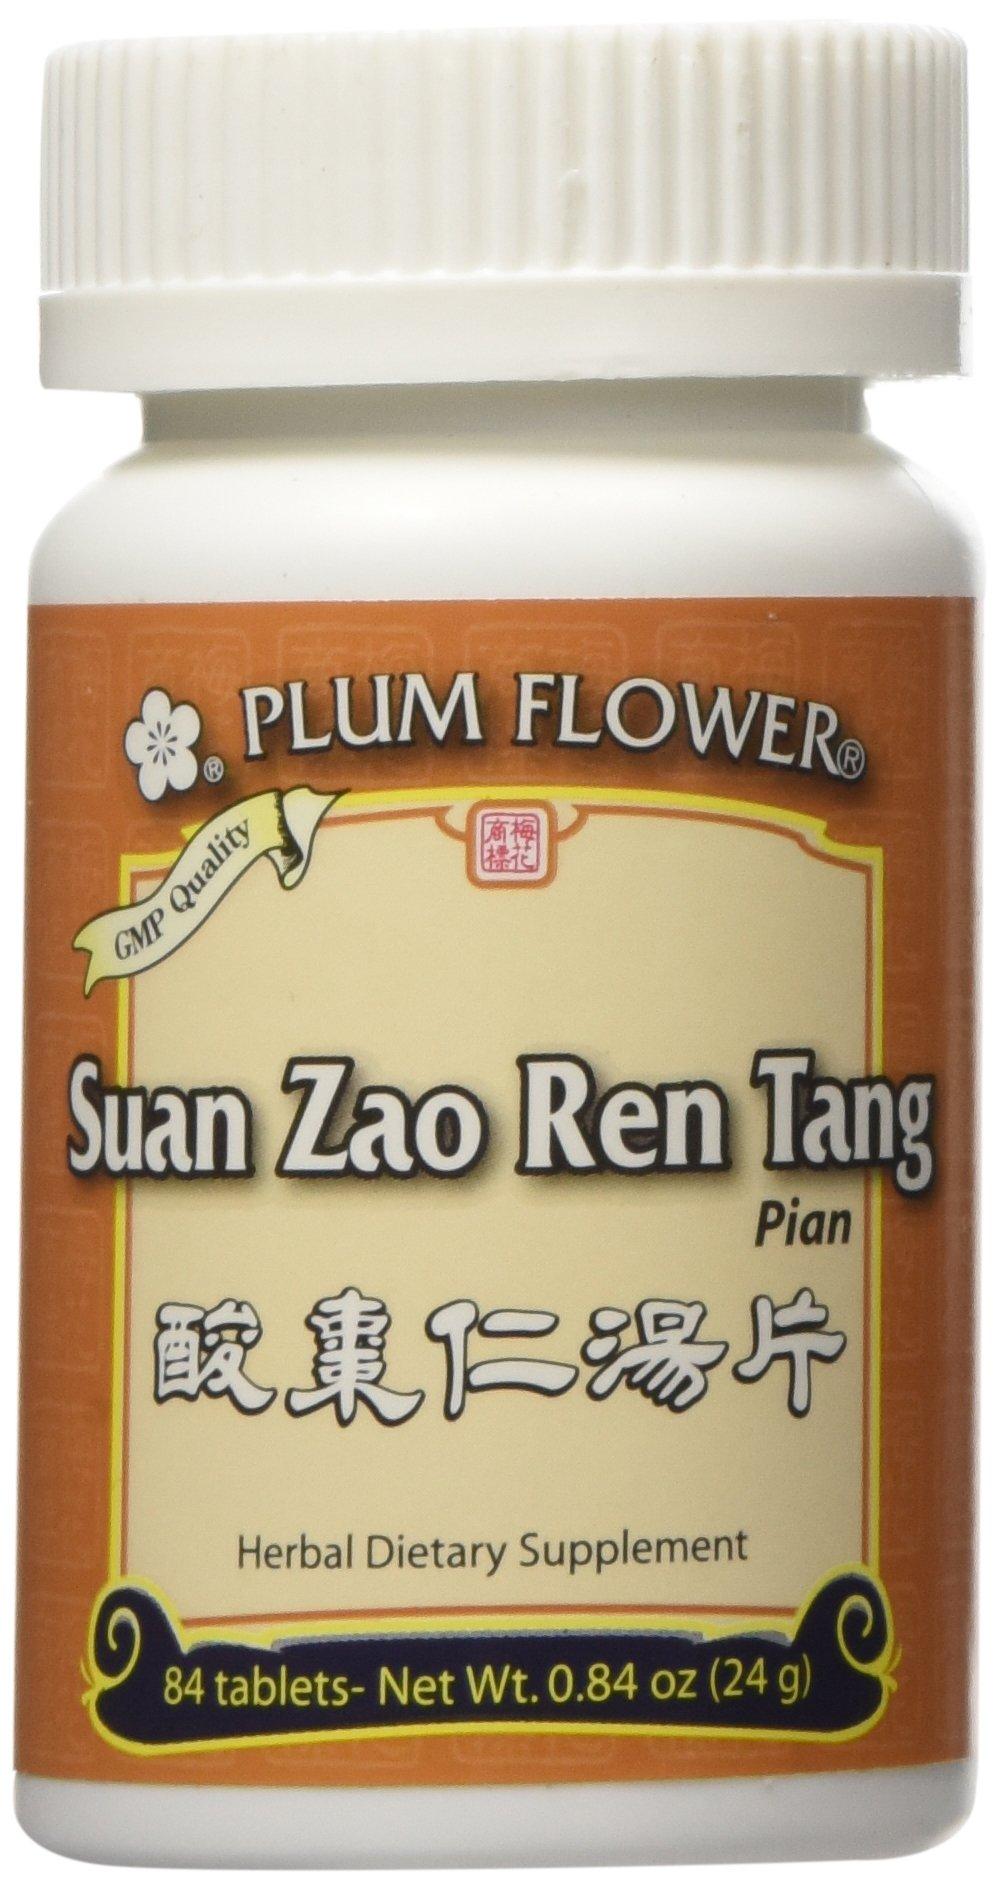 Suan Zao Ren Tang Tablets